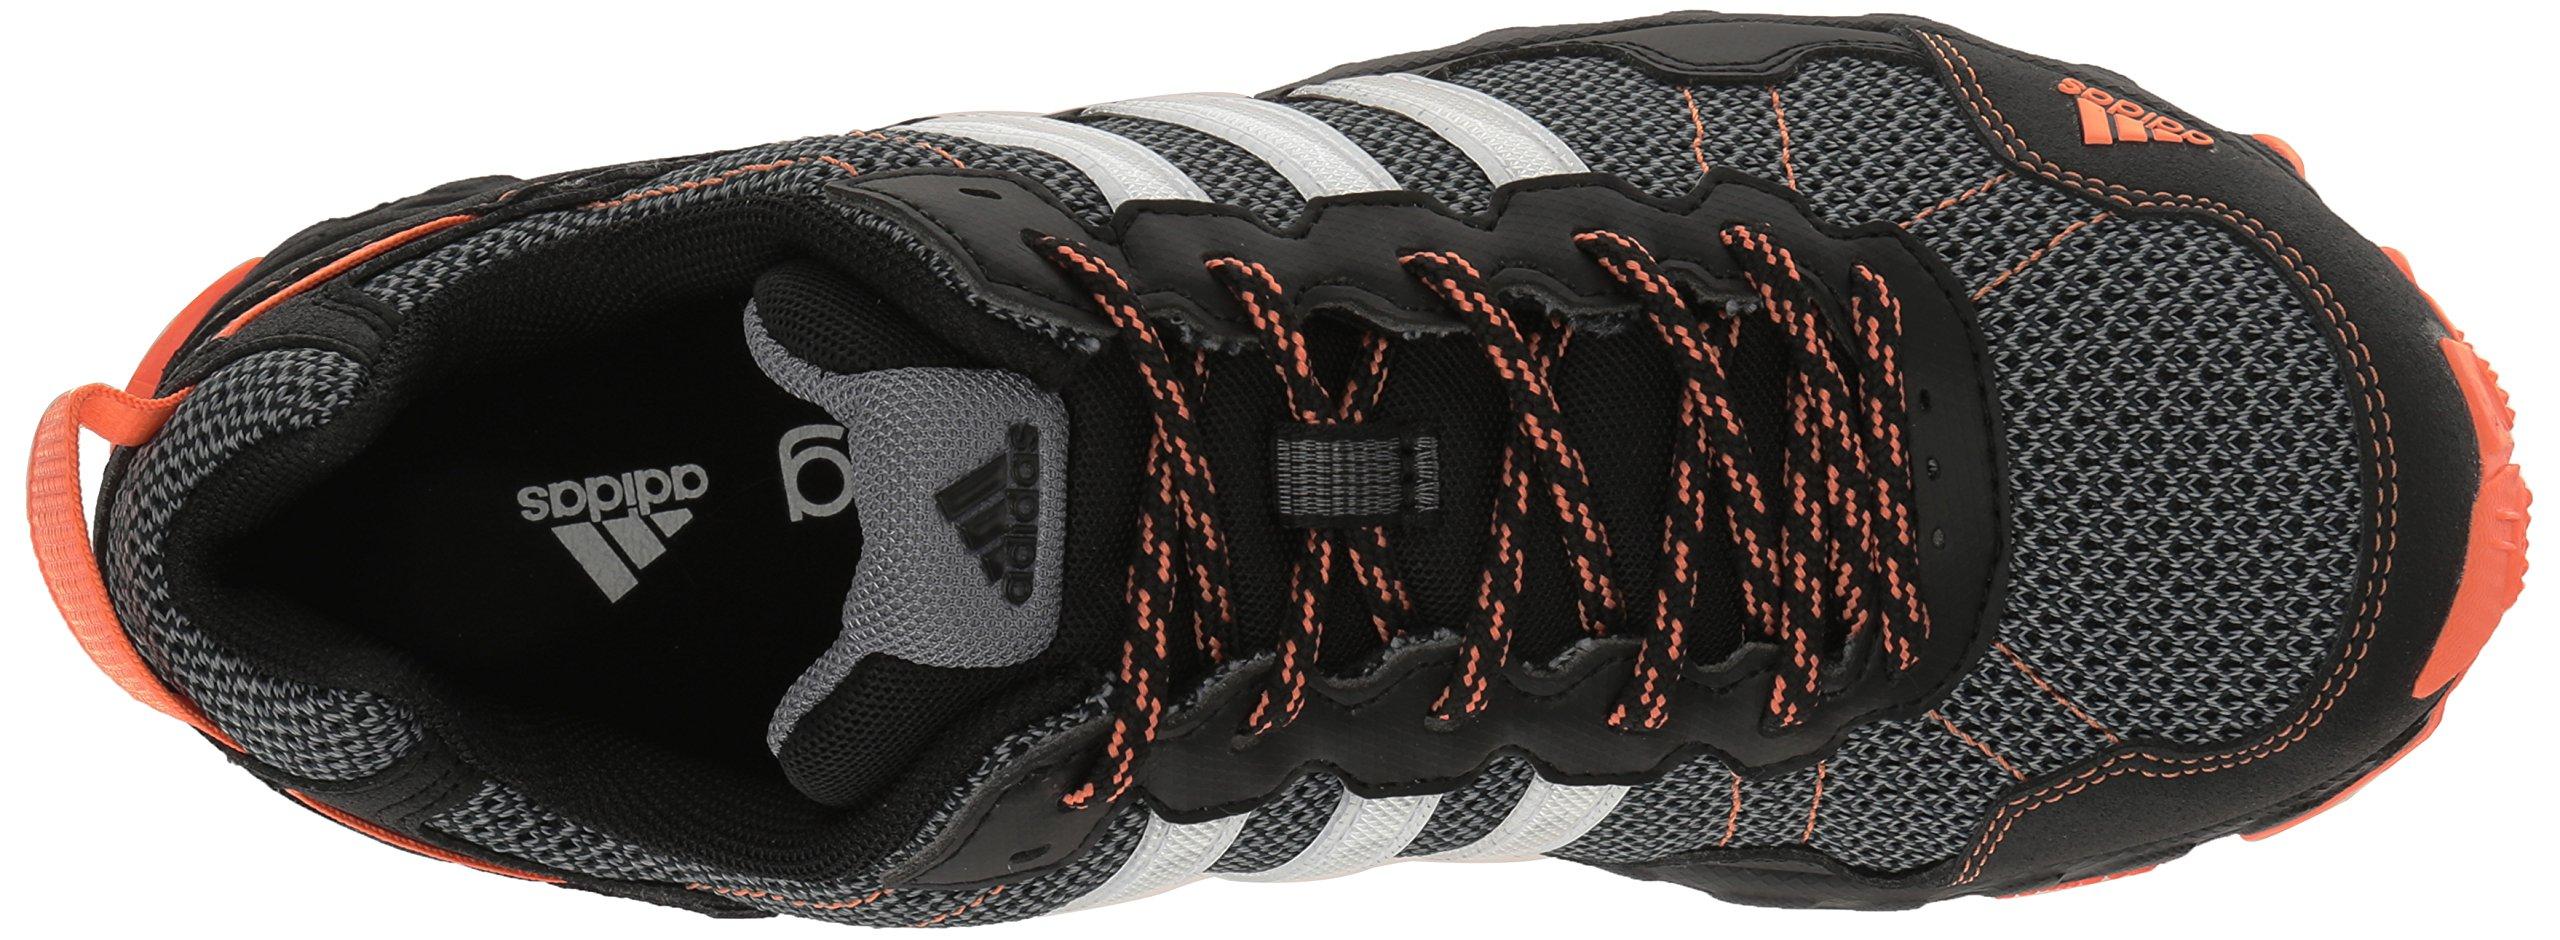 adidas Women's Rockadia Trail W Running Shoe Black/White/Easy Orange 6 M US by adidas (Image #8)